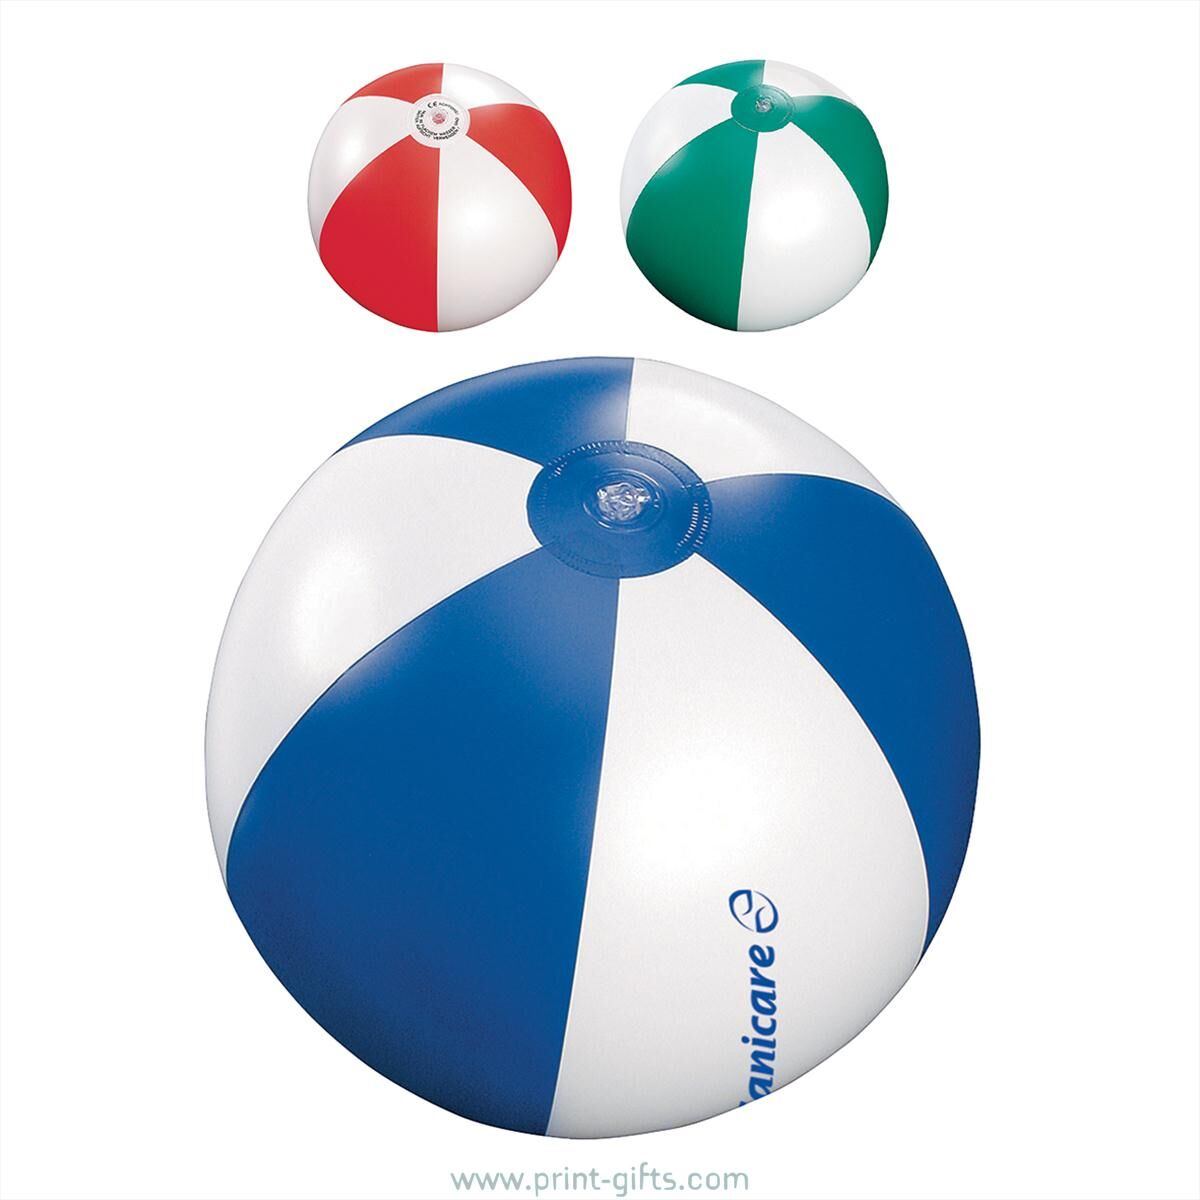 Promotional Printed Beachball